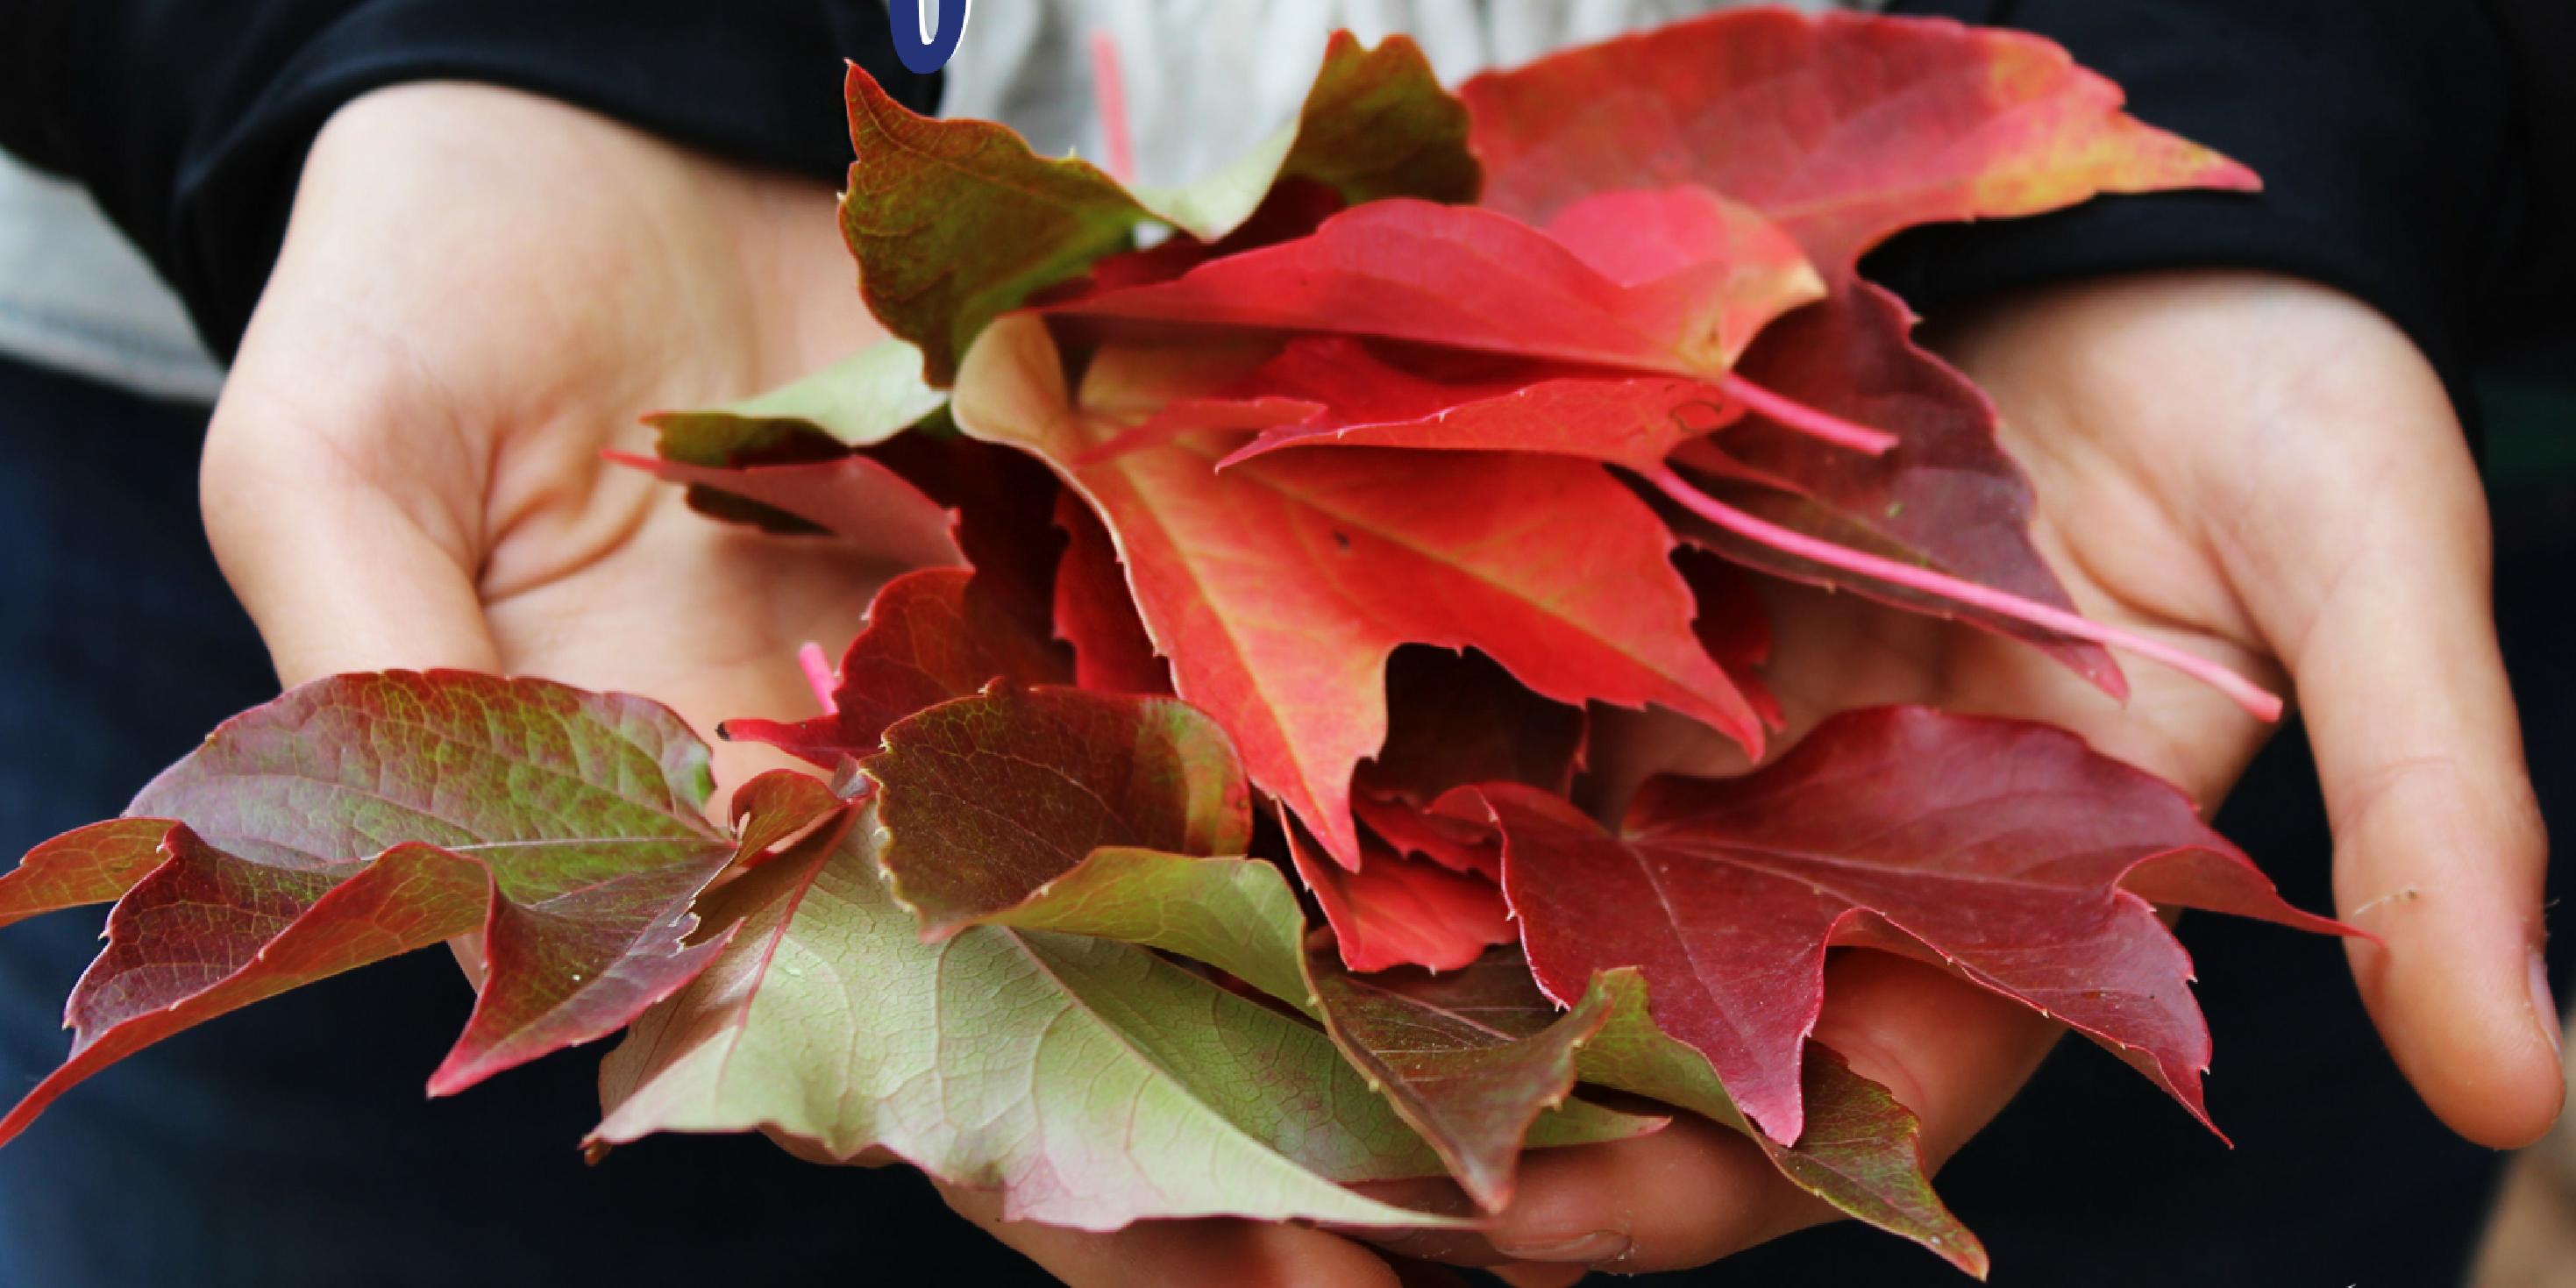 Shredded leaves are good for the flower bed